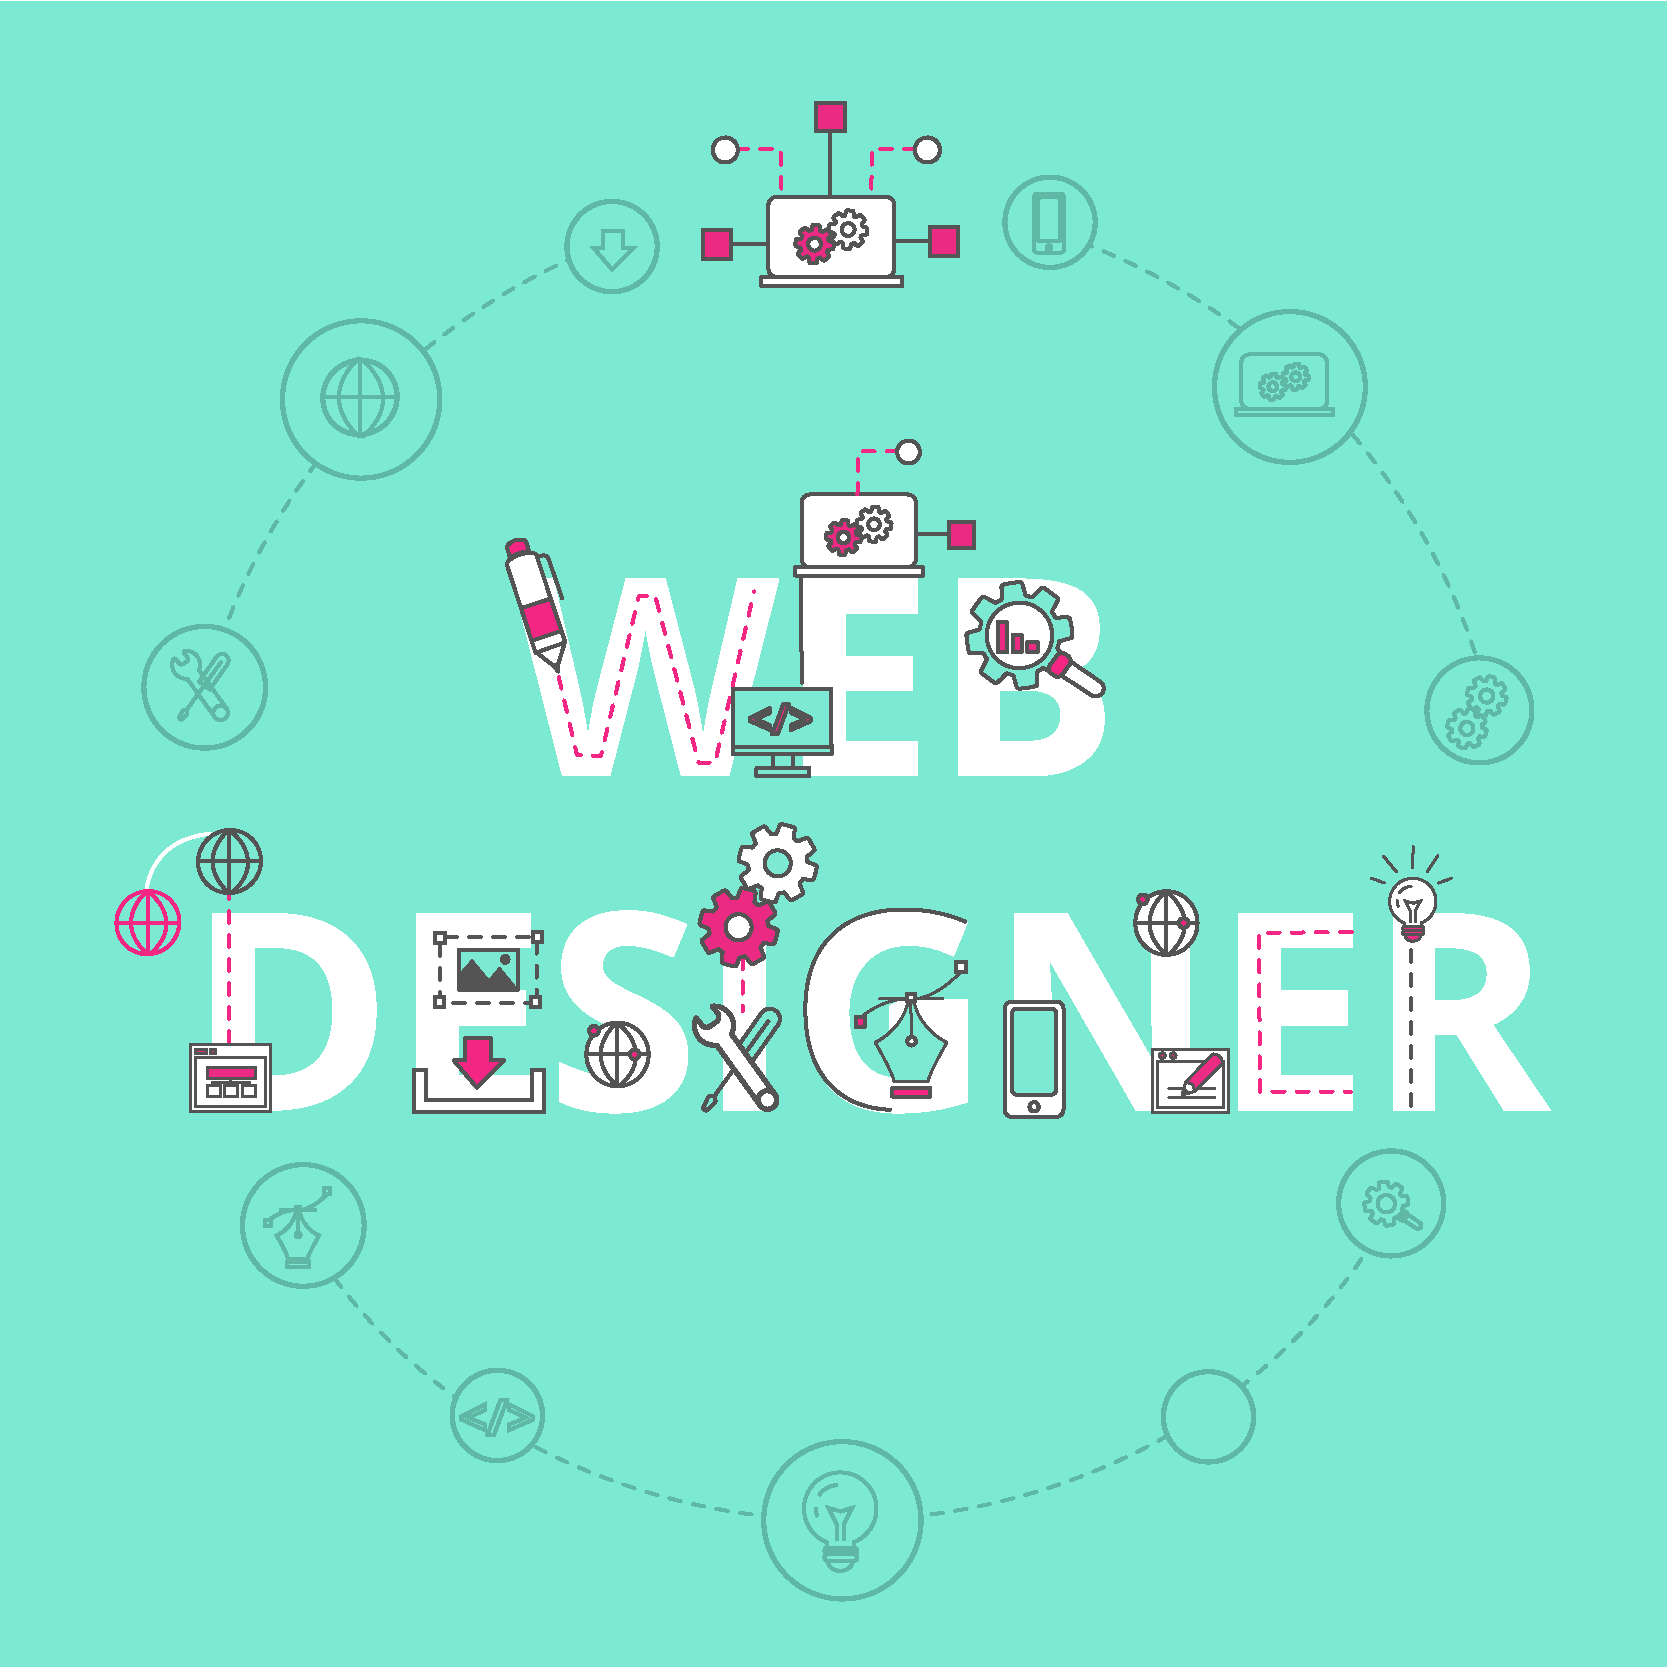 web designer career path profile banner